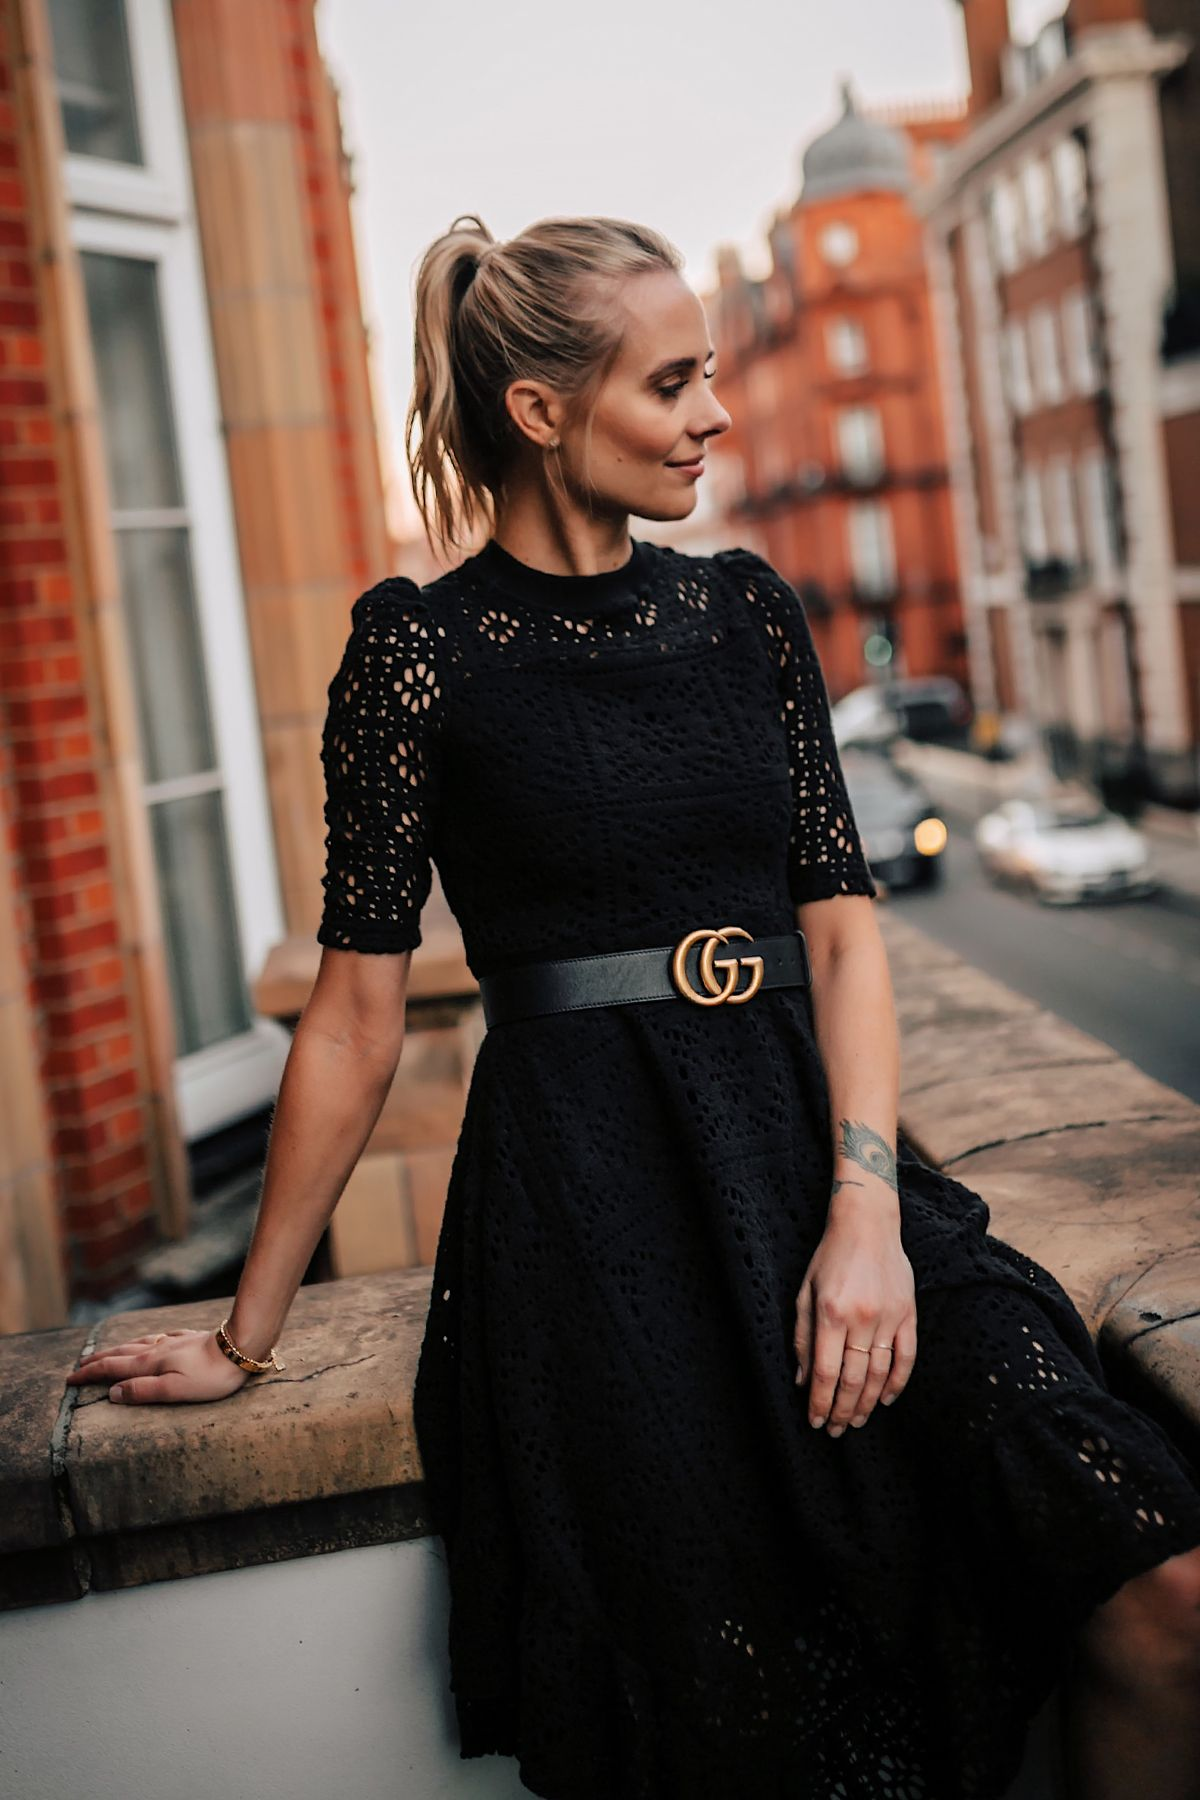 Blonde Women Wearing Black Lace Dress With Gucci Belt On London Balcony Black Lace Dress Outfit Winter Dress Outfits Fashion [ 1800 x 1200 Pixel ]